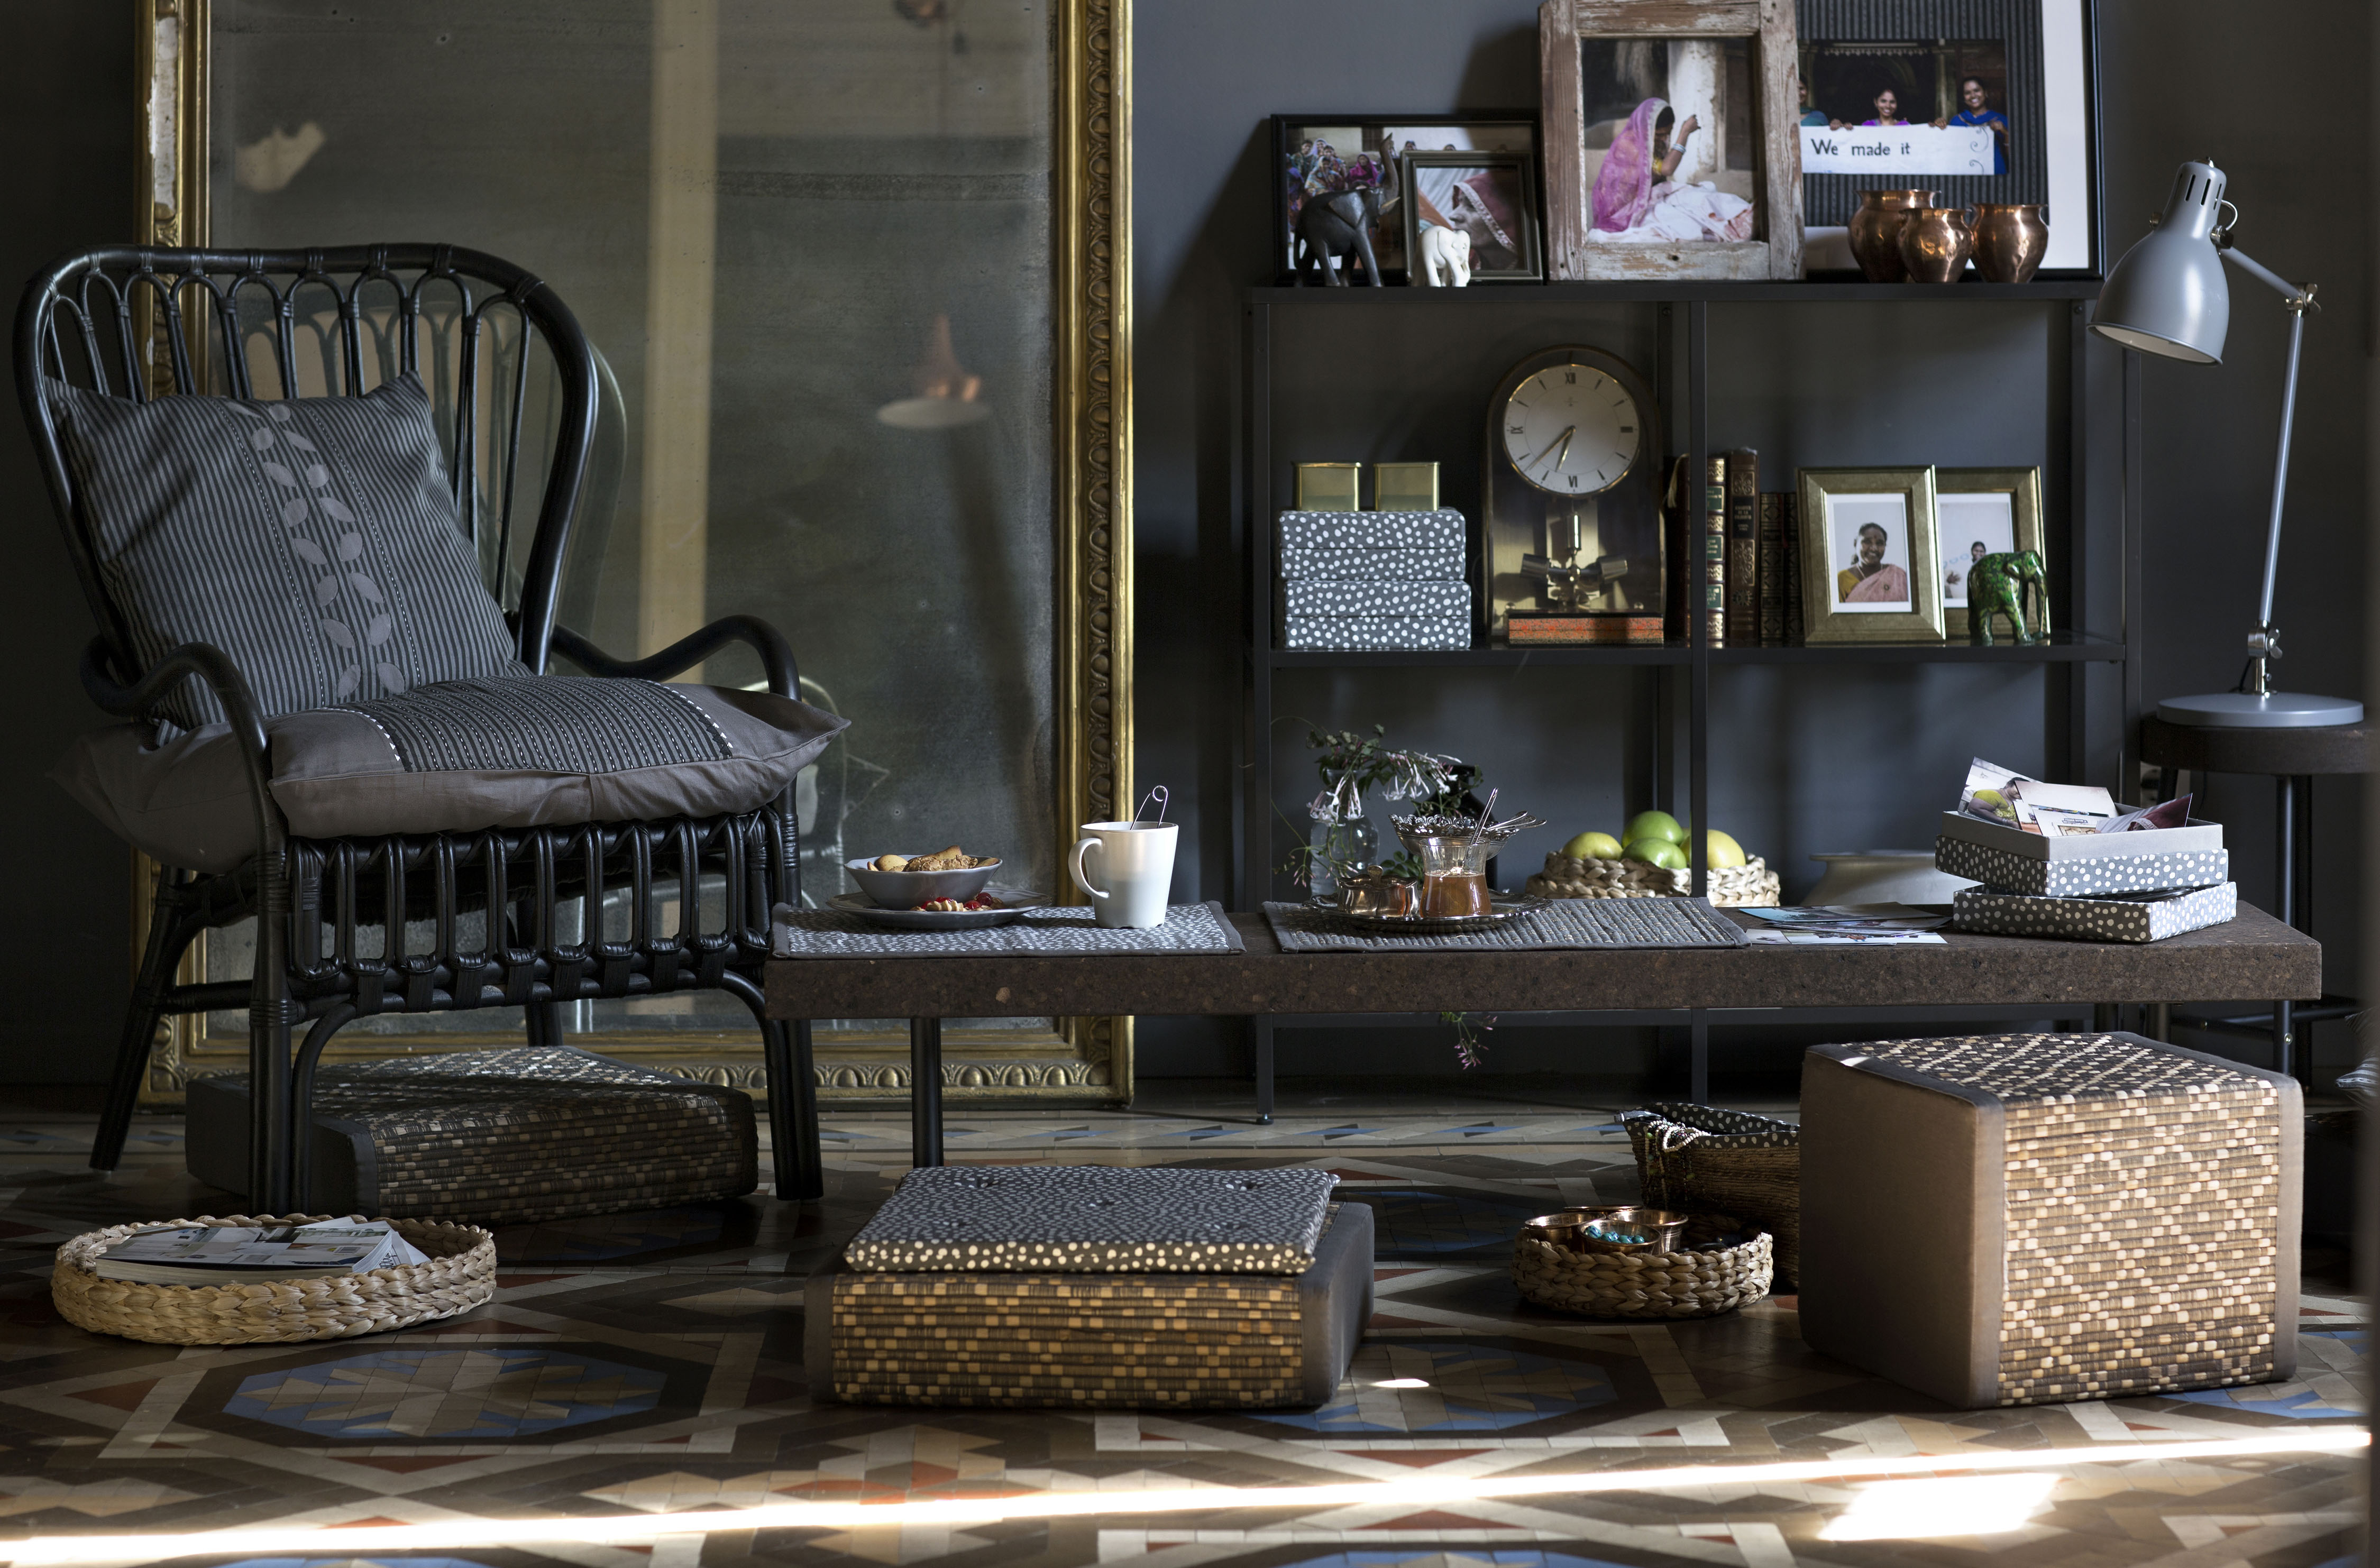 banana fiber rocking chair amazon sofa ikea 2017 catalog and collections revealed  30s magazine